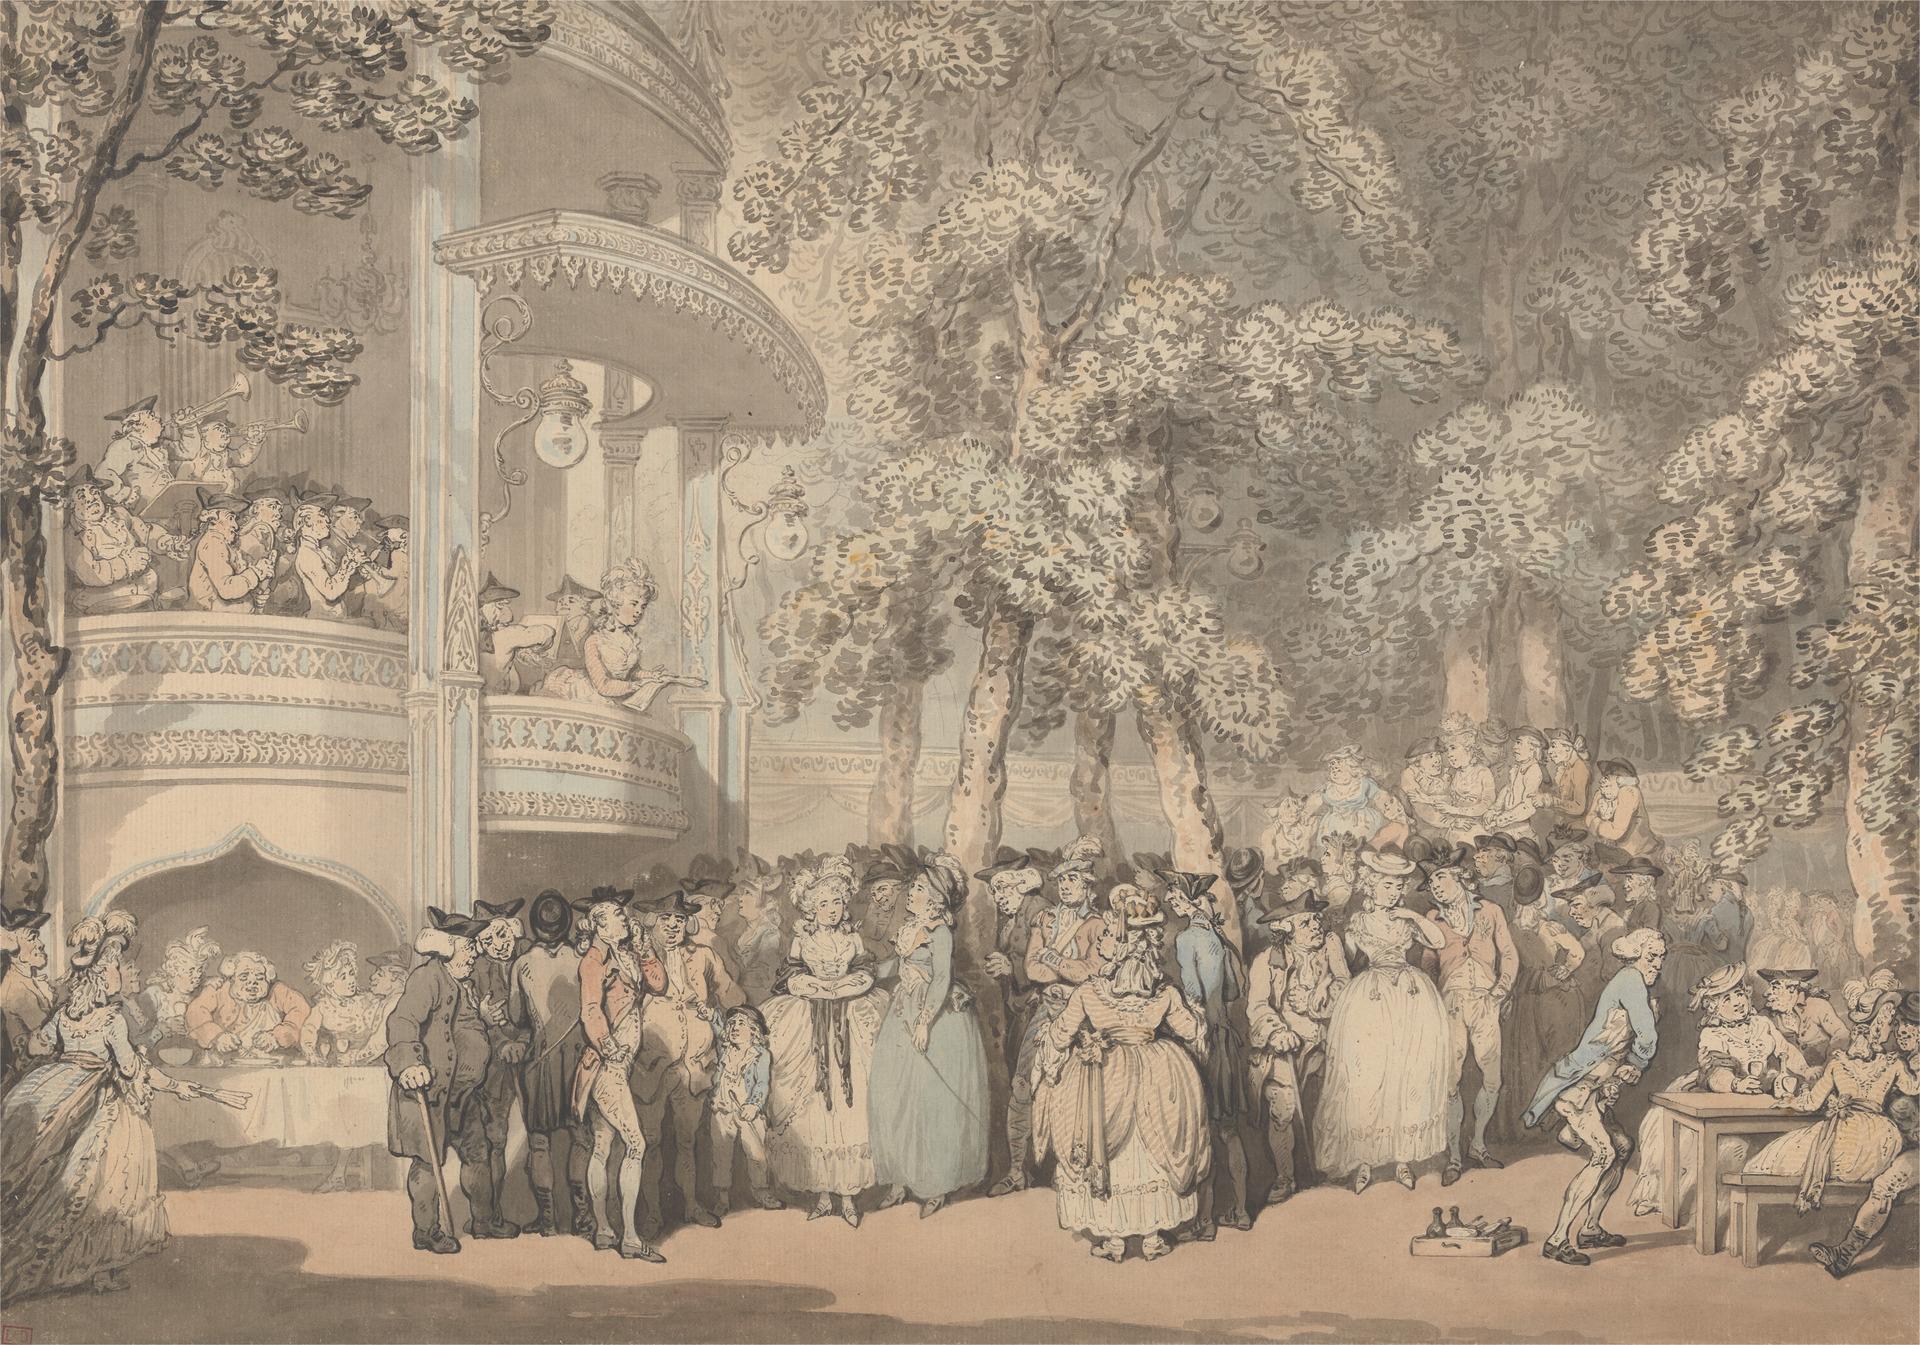 Vauxhall Pleasure Gardens: Licence: Public Domain, Yale Center for British Art